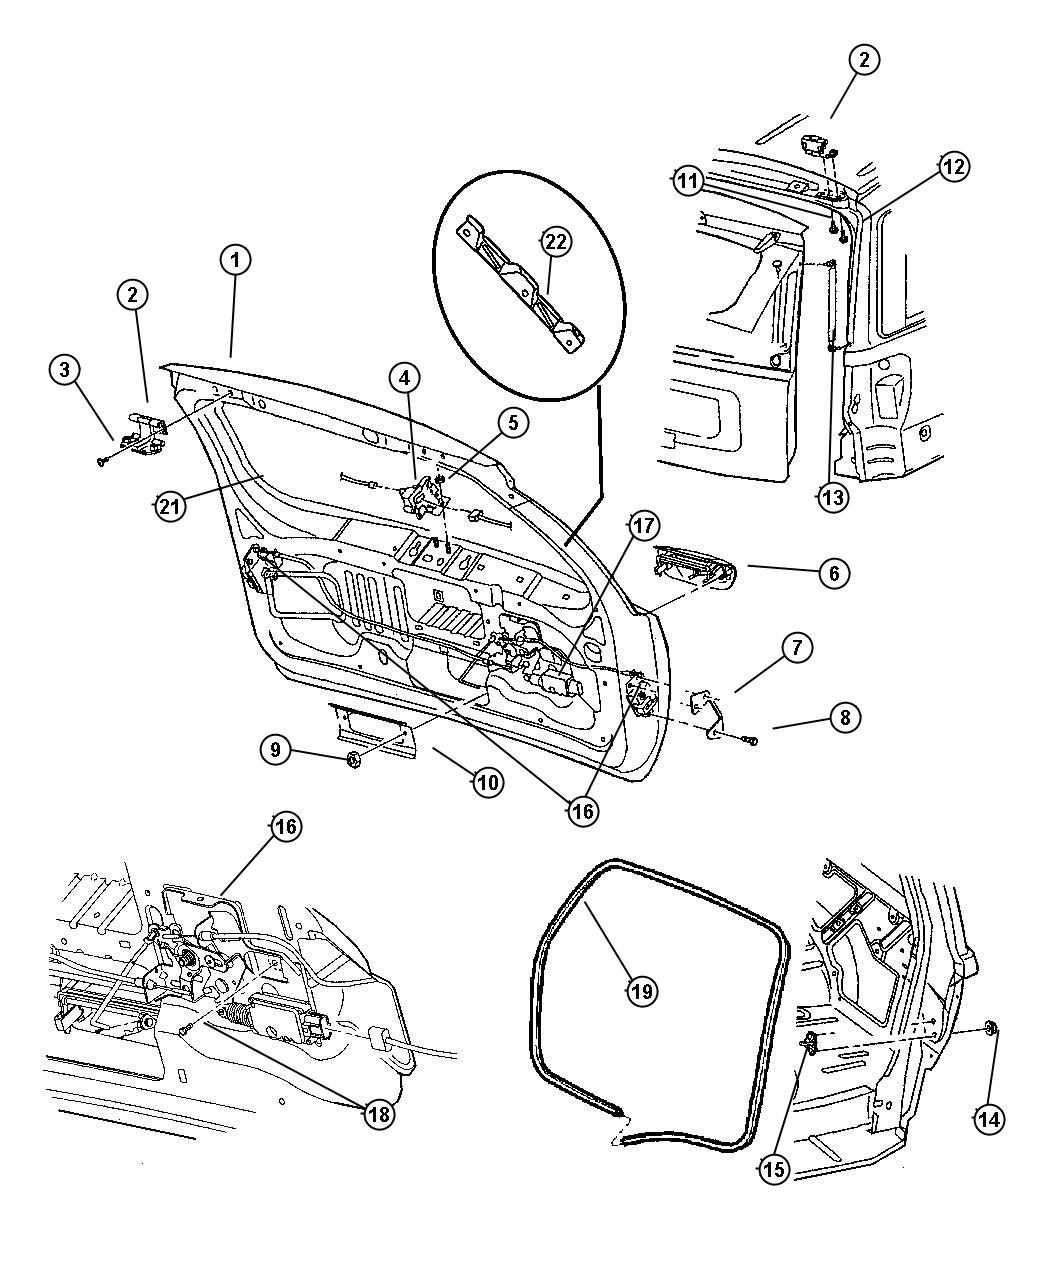 Jeep Grand Cherokee Handle. Liftgate. [ul], laredo, [ul